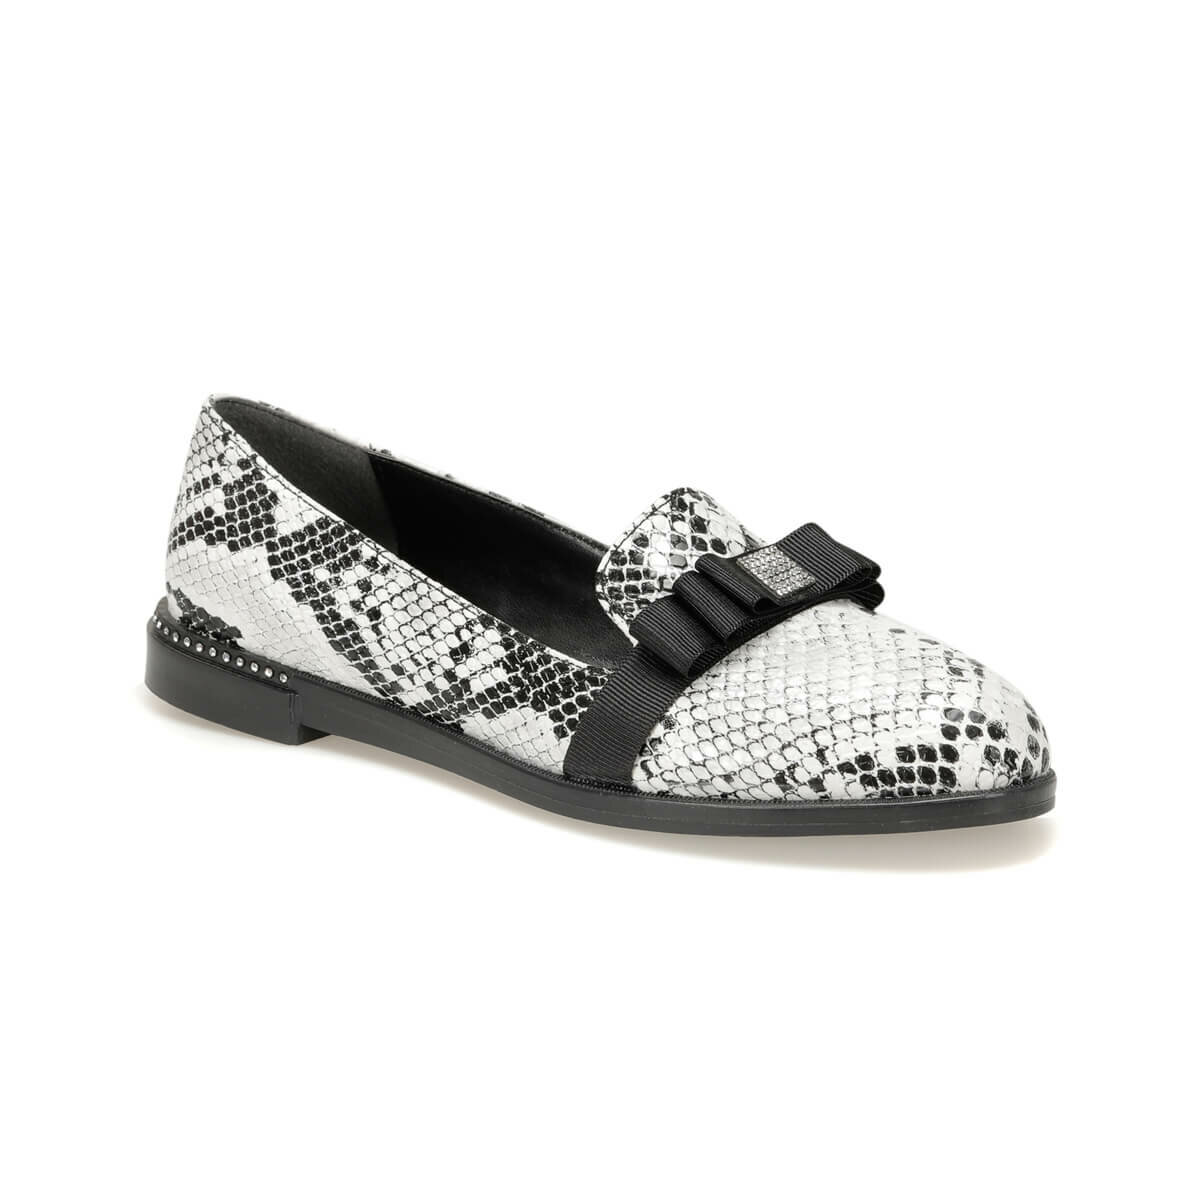 FLO STEWART91Z SKIN Snake Color Women Loafer Shoes BUTIGO